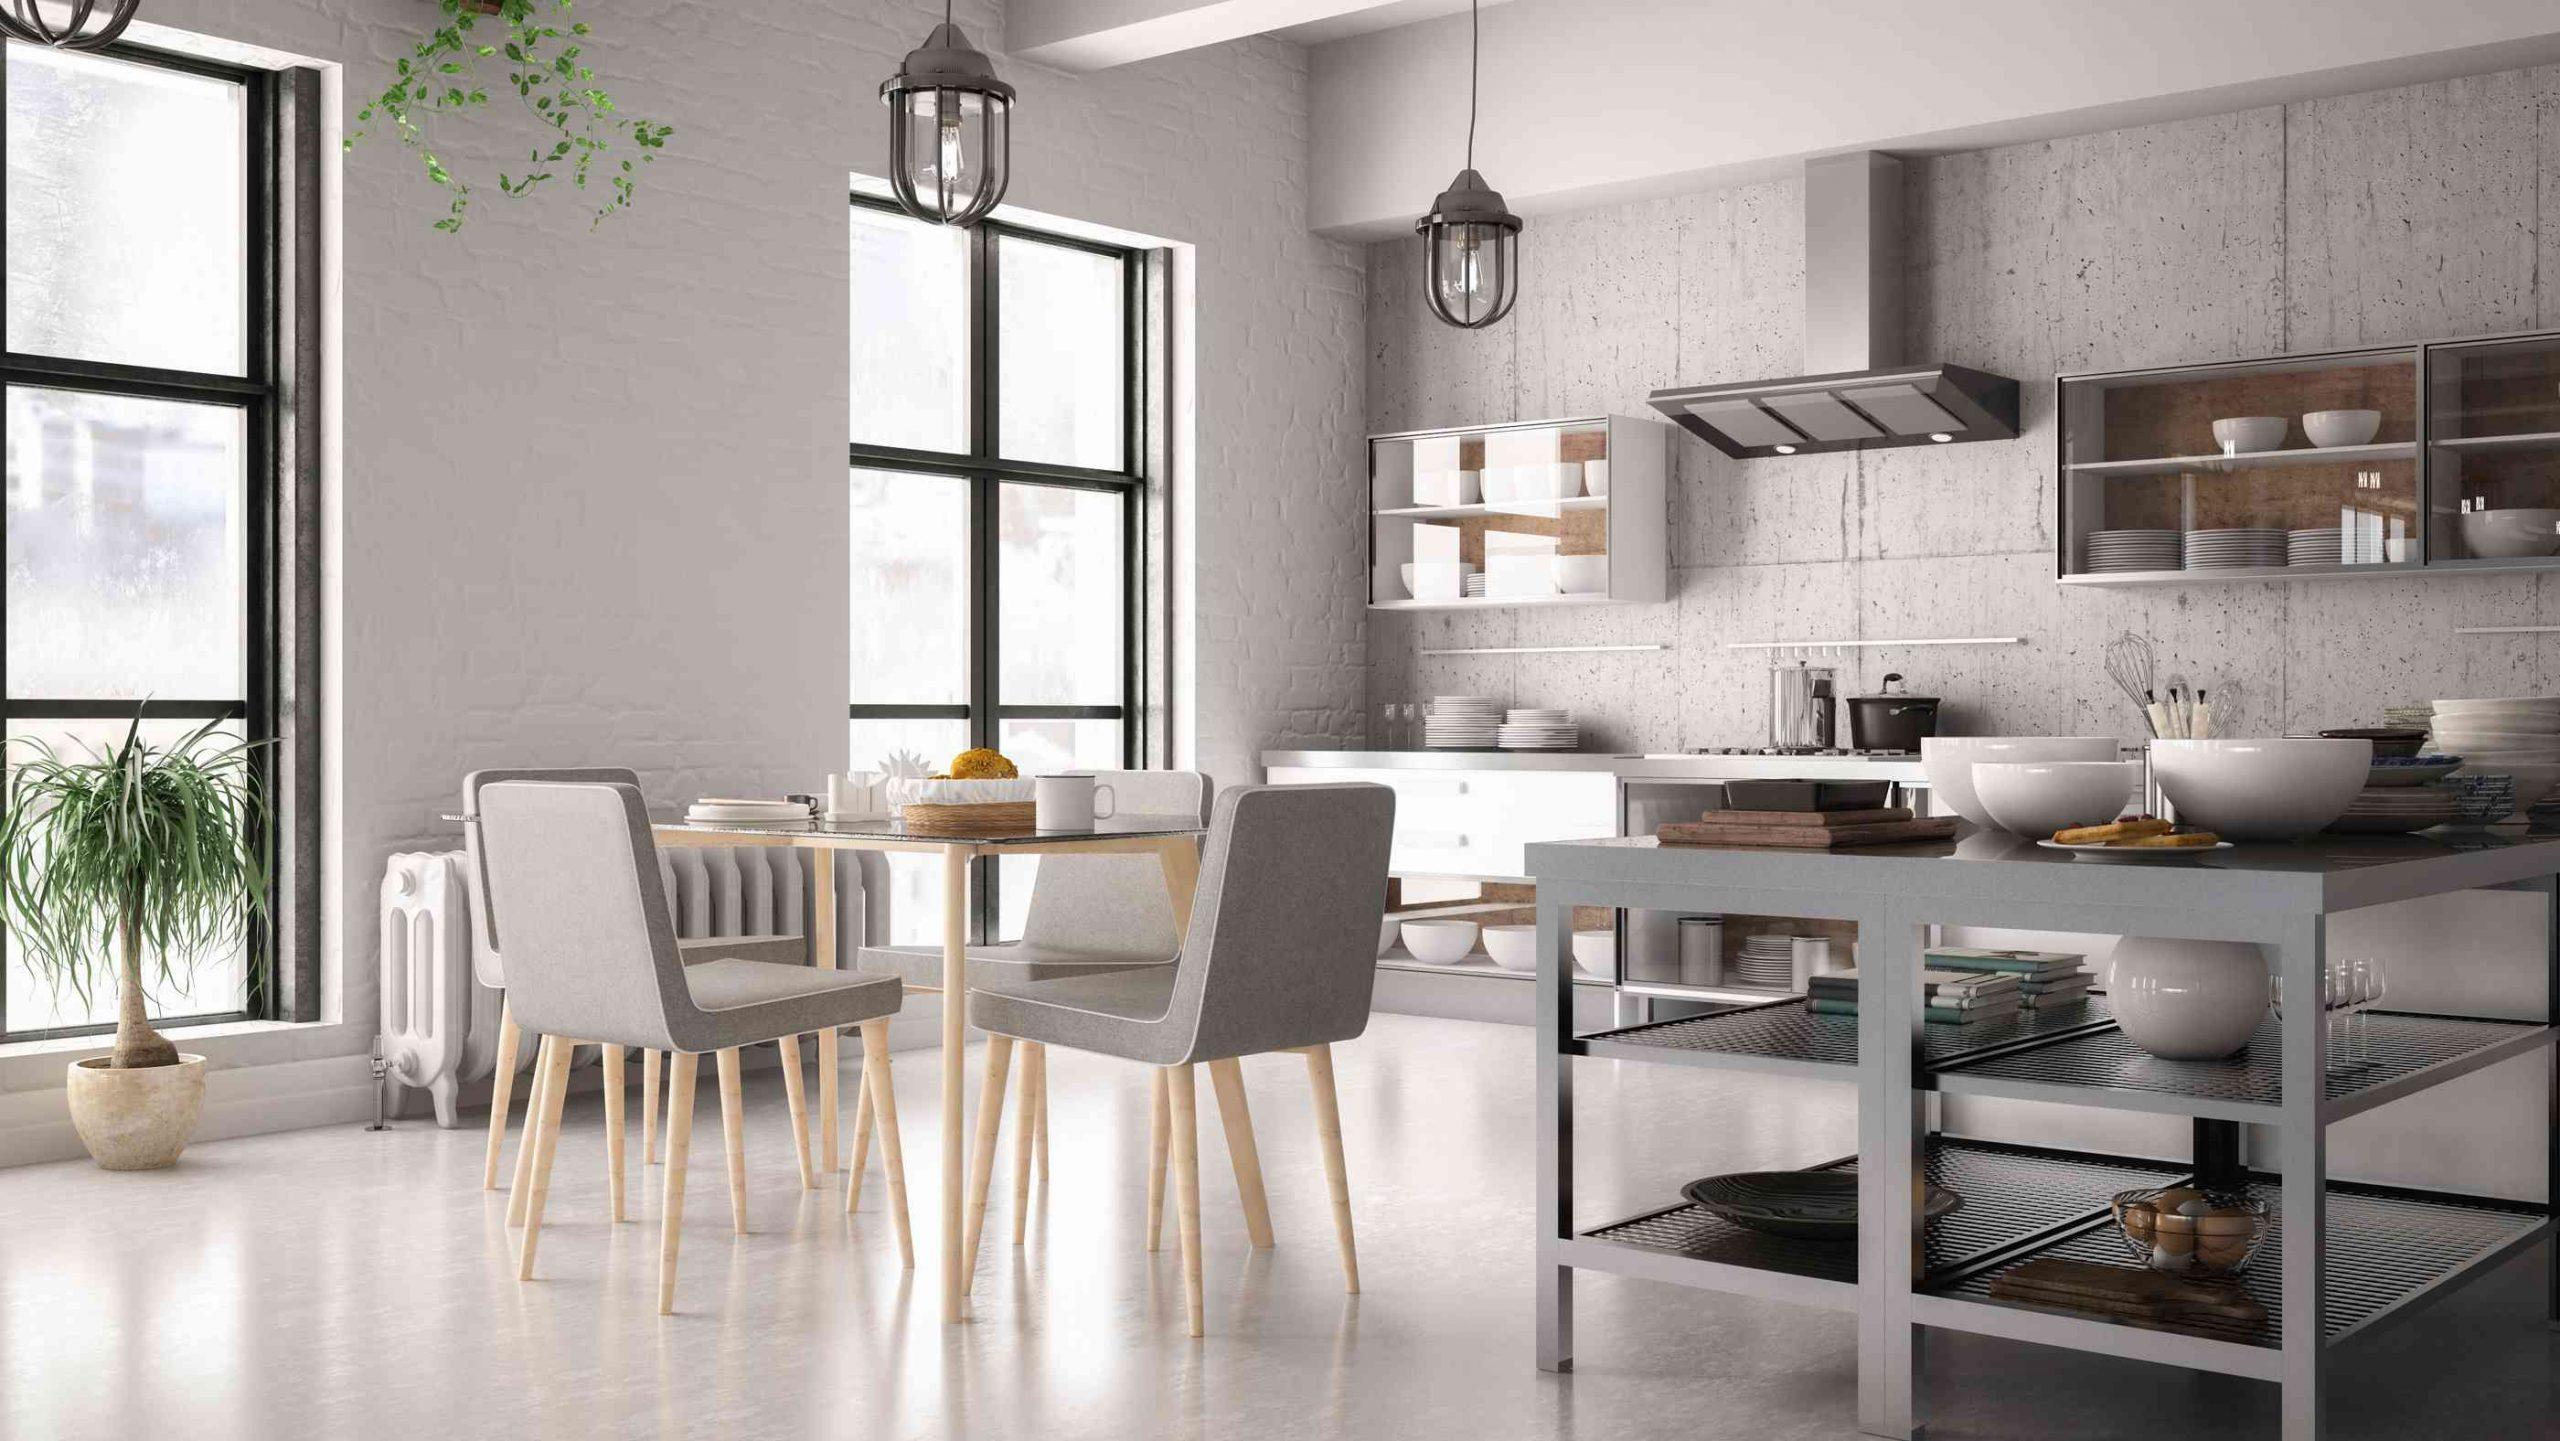 Full Size of Bodenbelag In Küche Küchenboden Erneuern Moderner Bodenbelag Küche Bodenbeläge Für Küche Und Flur Küche Bodenbelag Küche